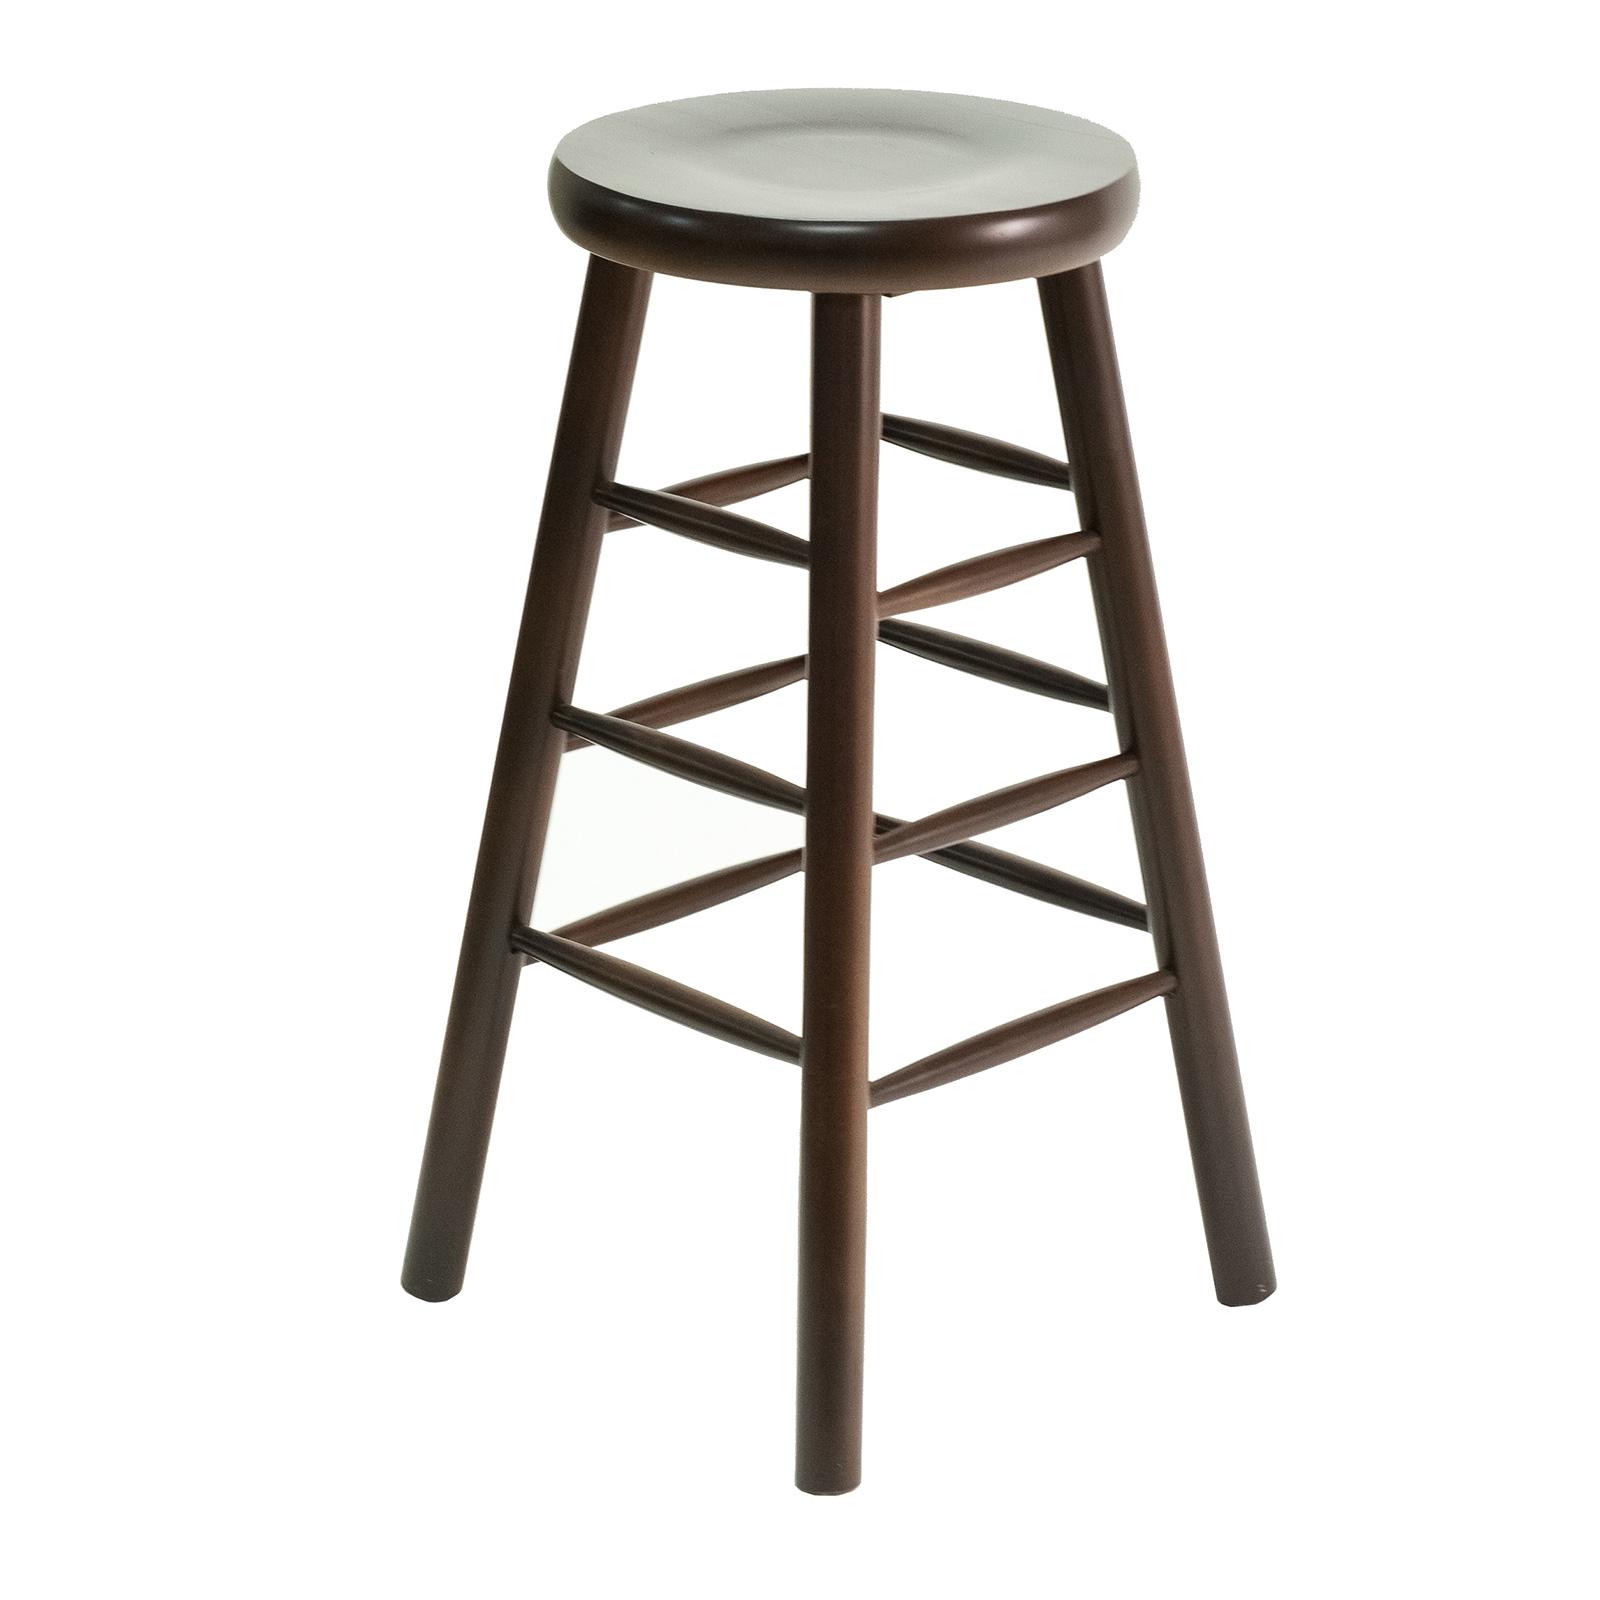 BB-30 GR1 Florida Seating bar stool, indoor